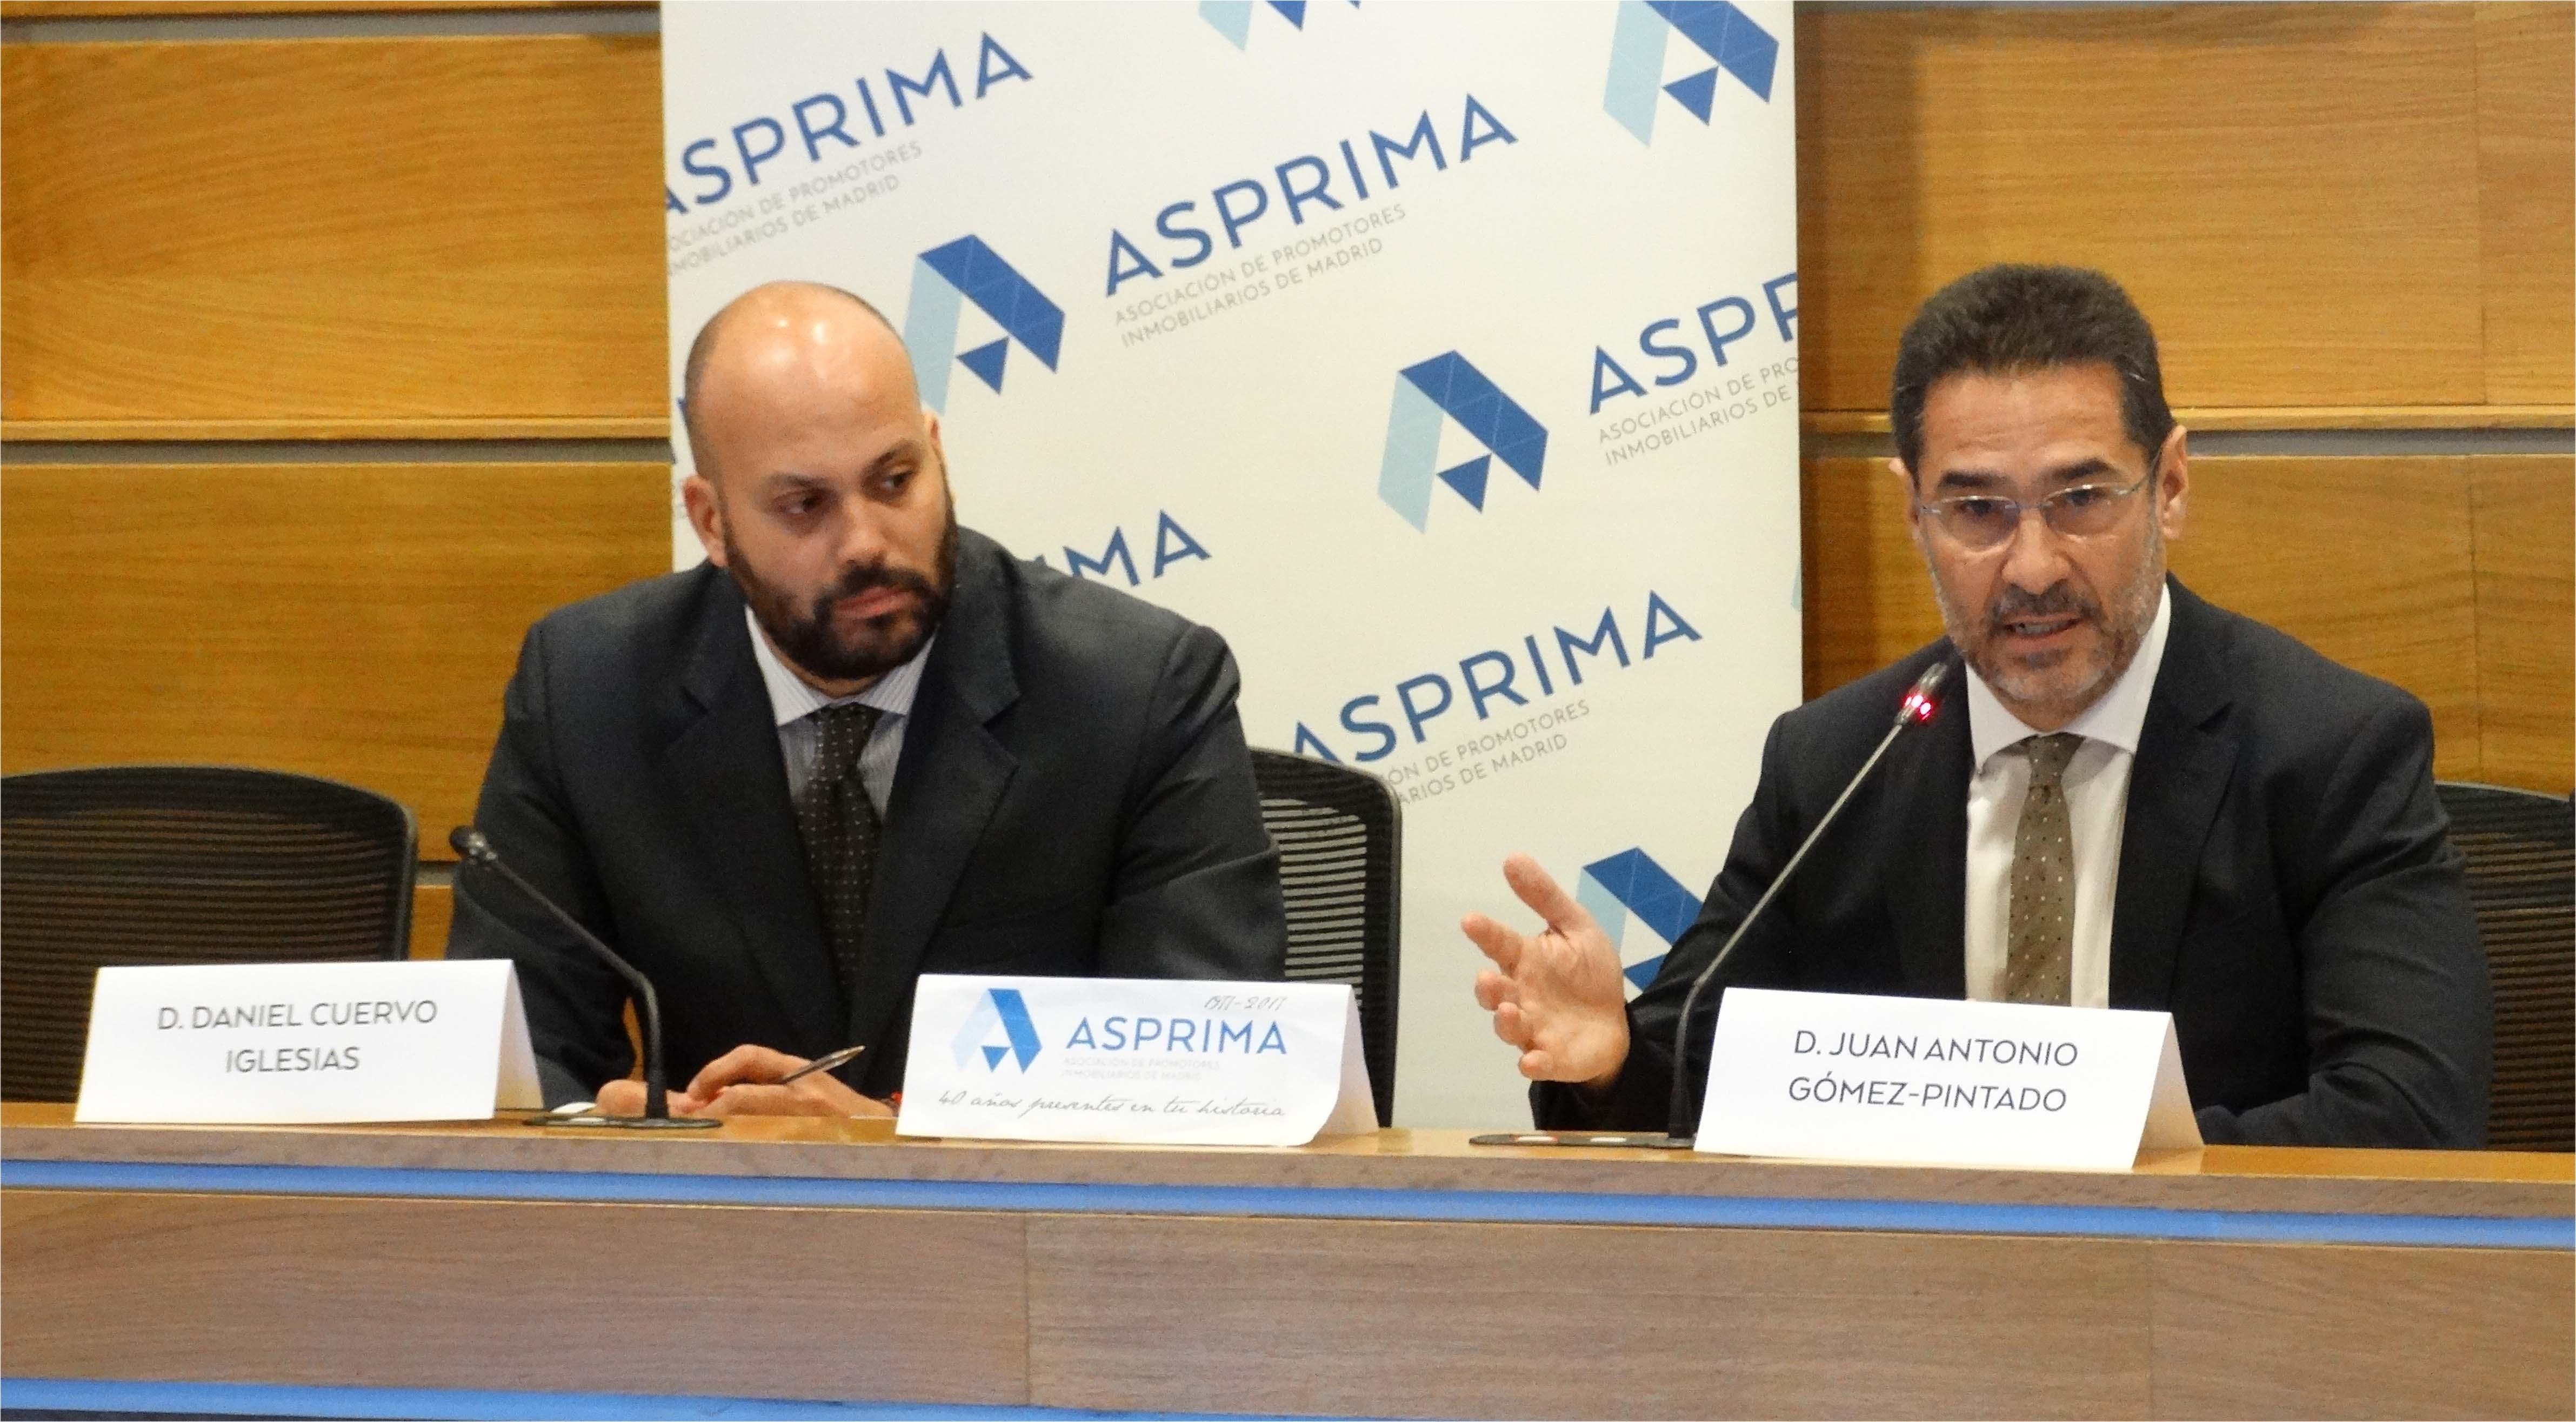 Daniel Cuervo (izqda) y Juan Antonio Gómez-Pintado (dcha.), de Asprima / Asprima